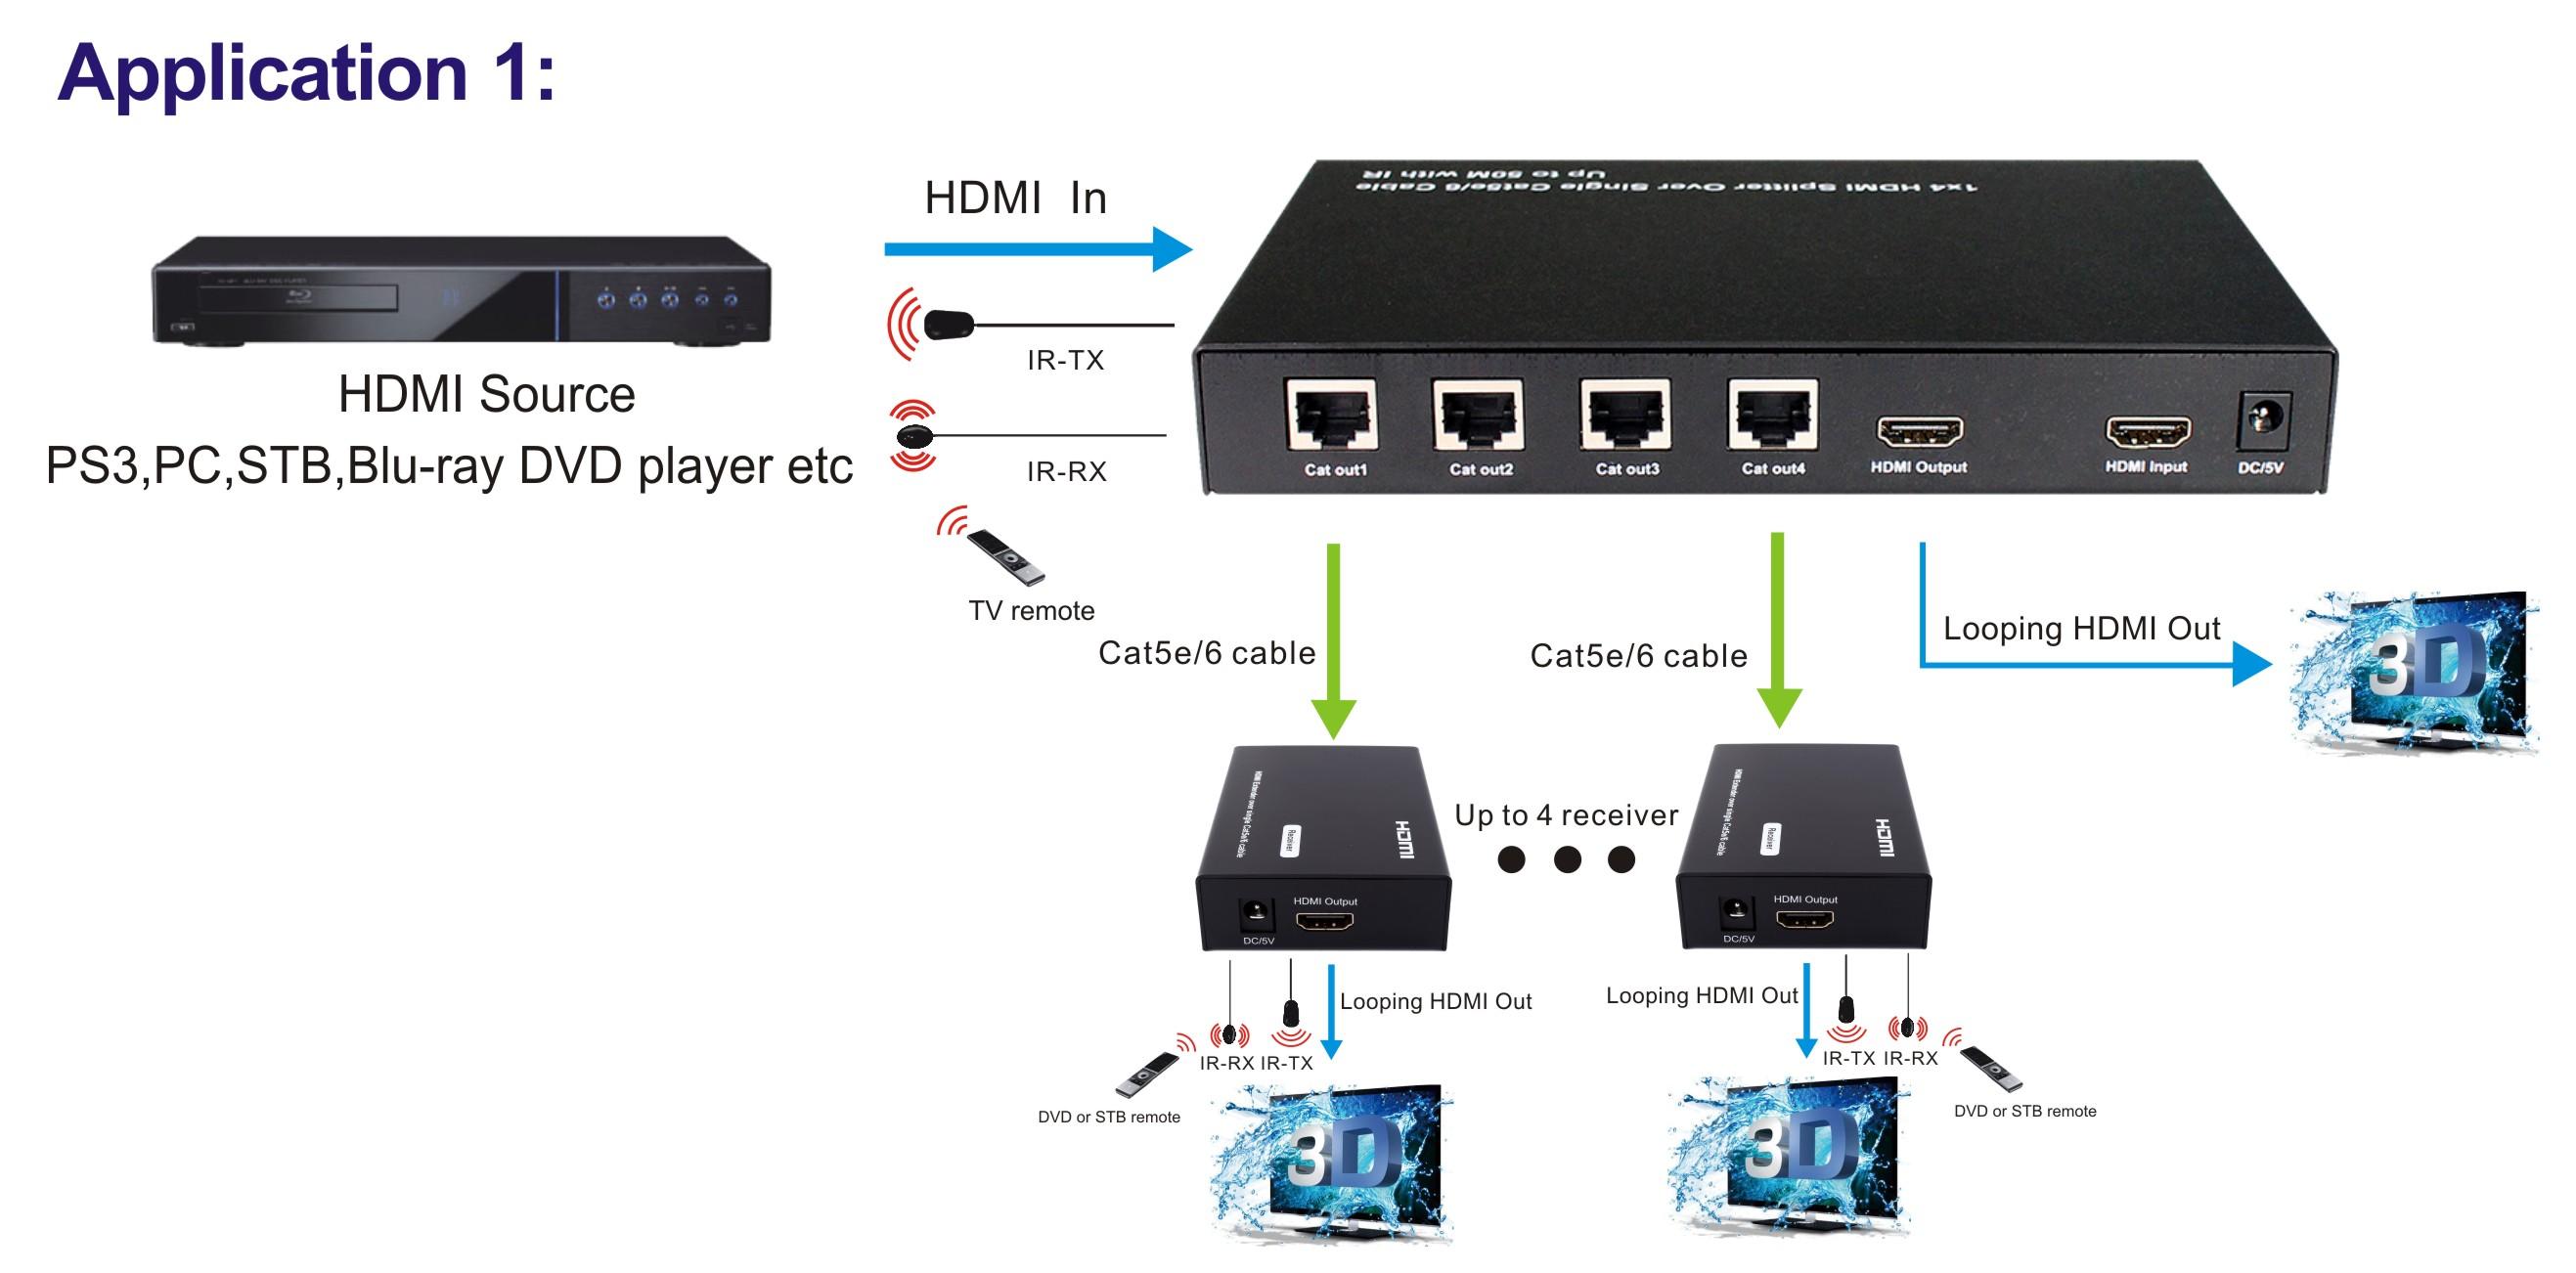 hdmi over cat5e wiring diagram cat 5e cable diagram